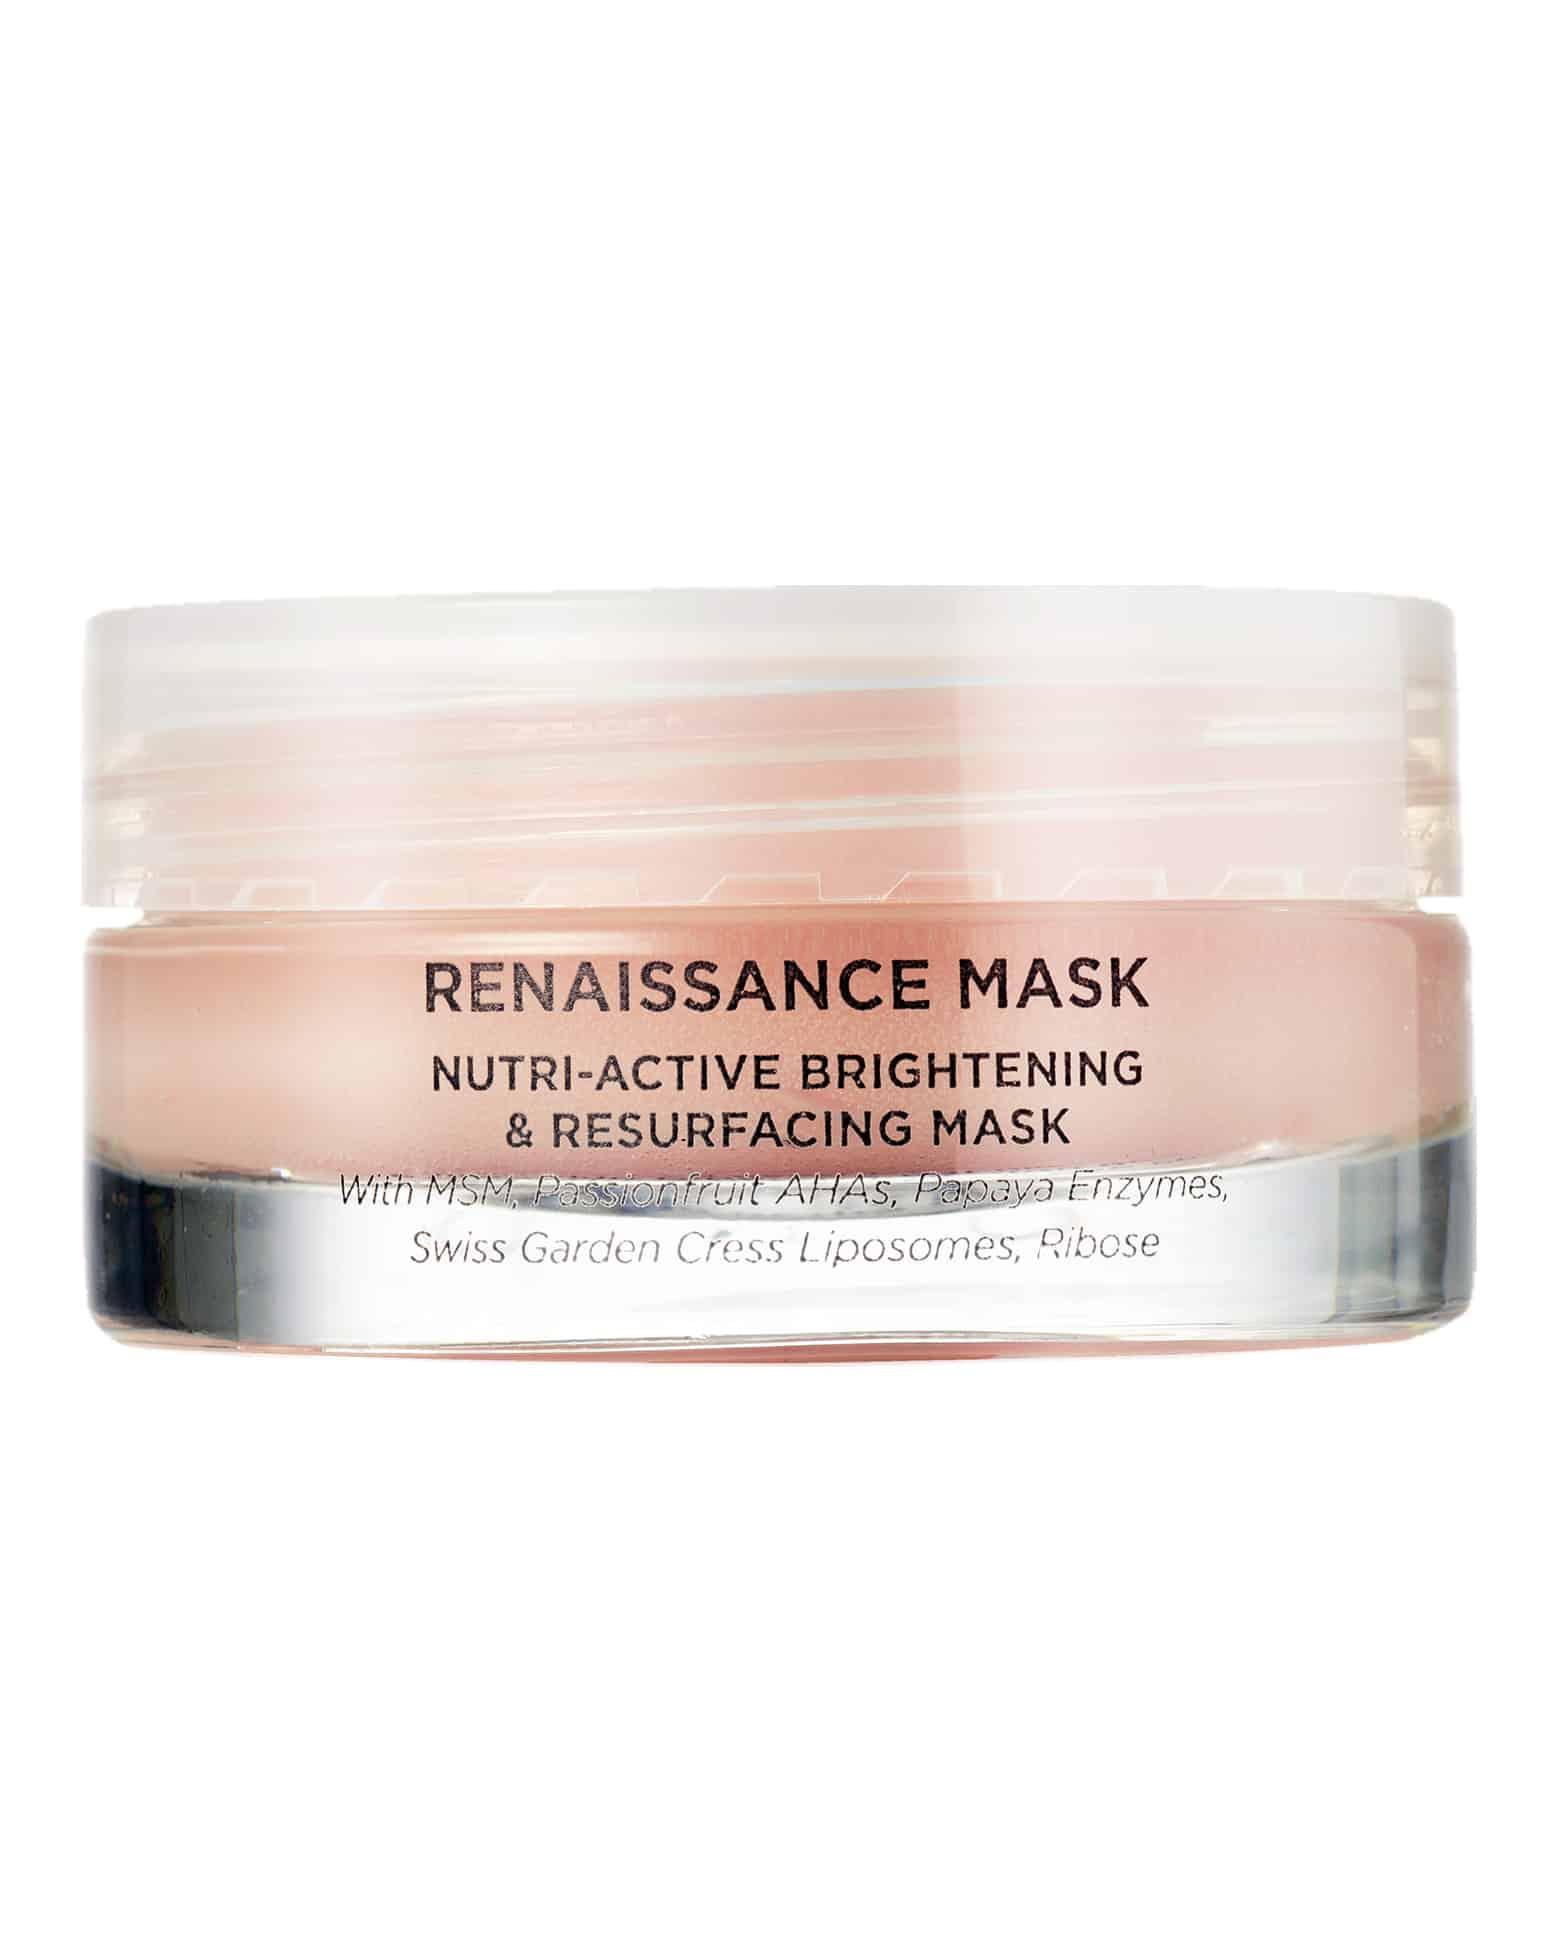 Oskia_Renaissance_Mask